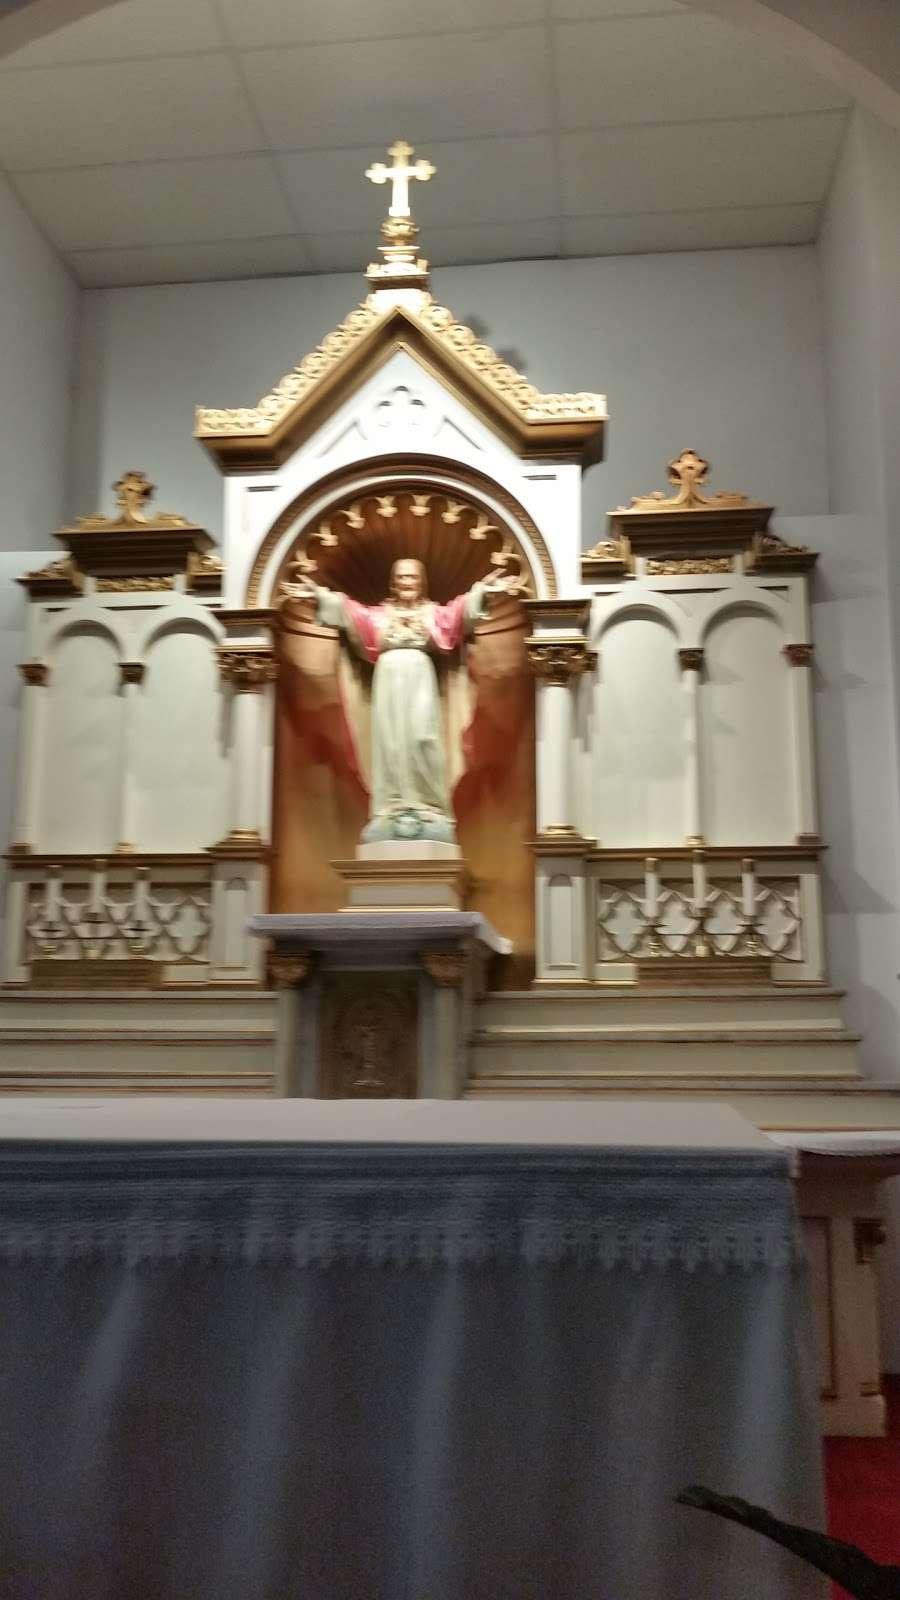 St. Andrew Kim Catholic Church - church    Photo 3 of 10   Address: 2111 Camino Lago, Irving, TX 75039, USA   Phone: (972) 620-9150